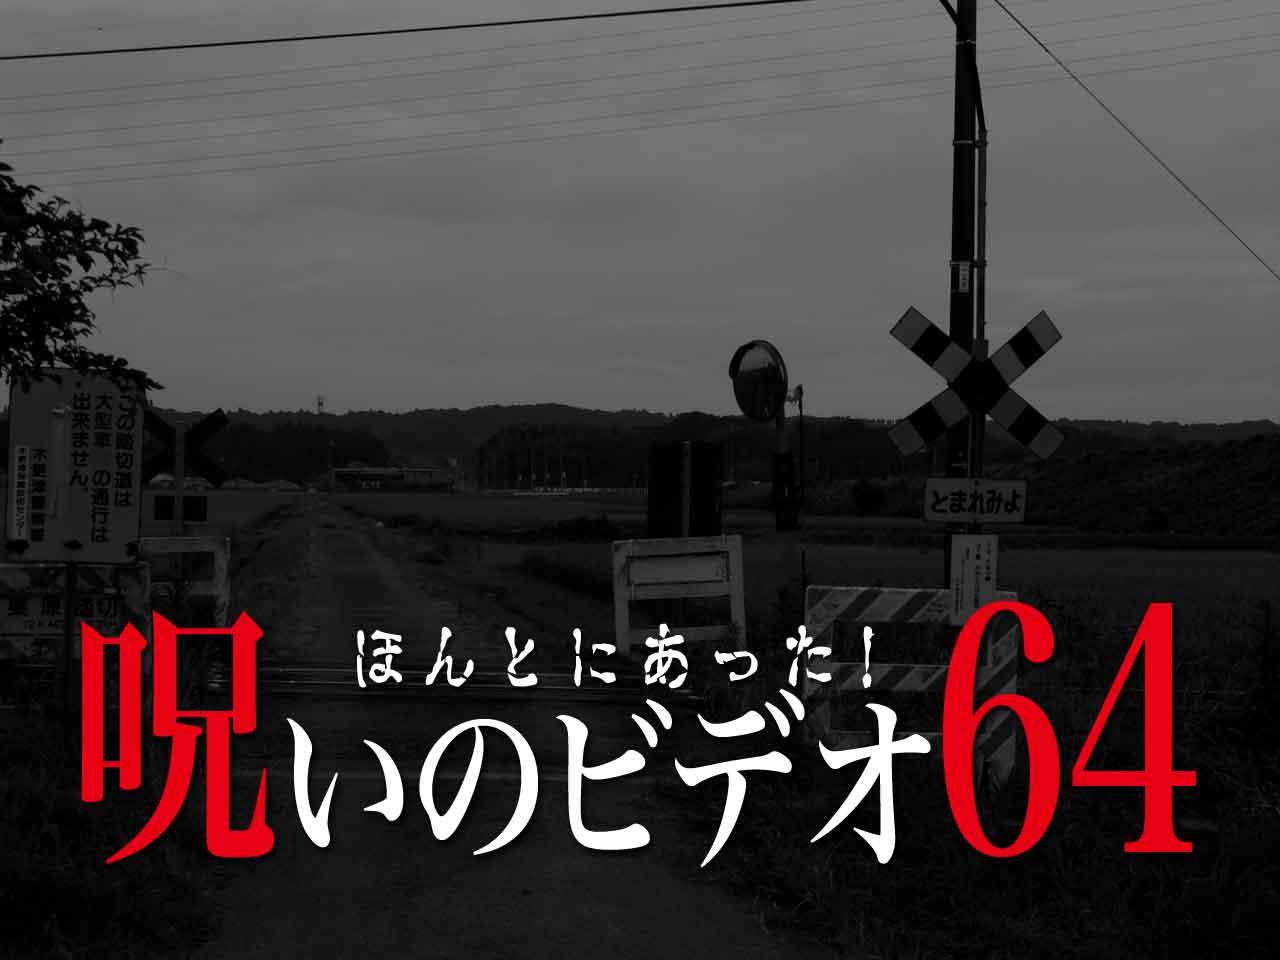 eye_catch_noro_64